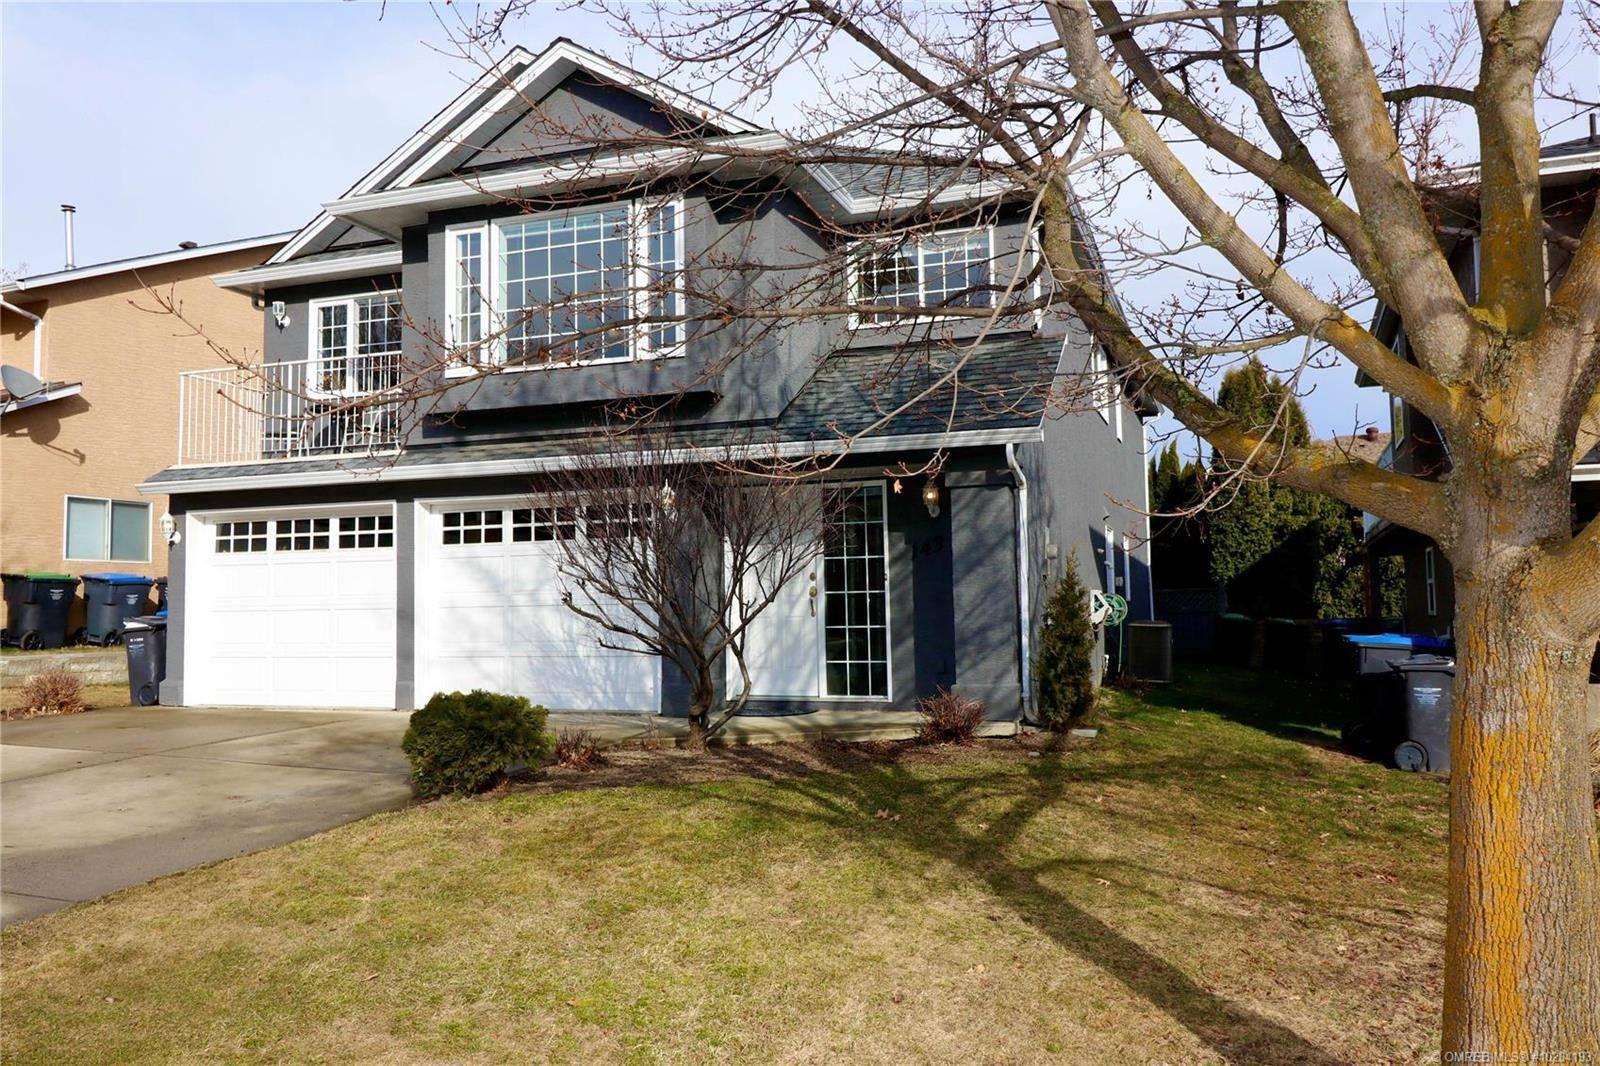 House for sale at 143 Summerhill Pl Kelowna British Columbia - MLS: 10204193